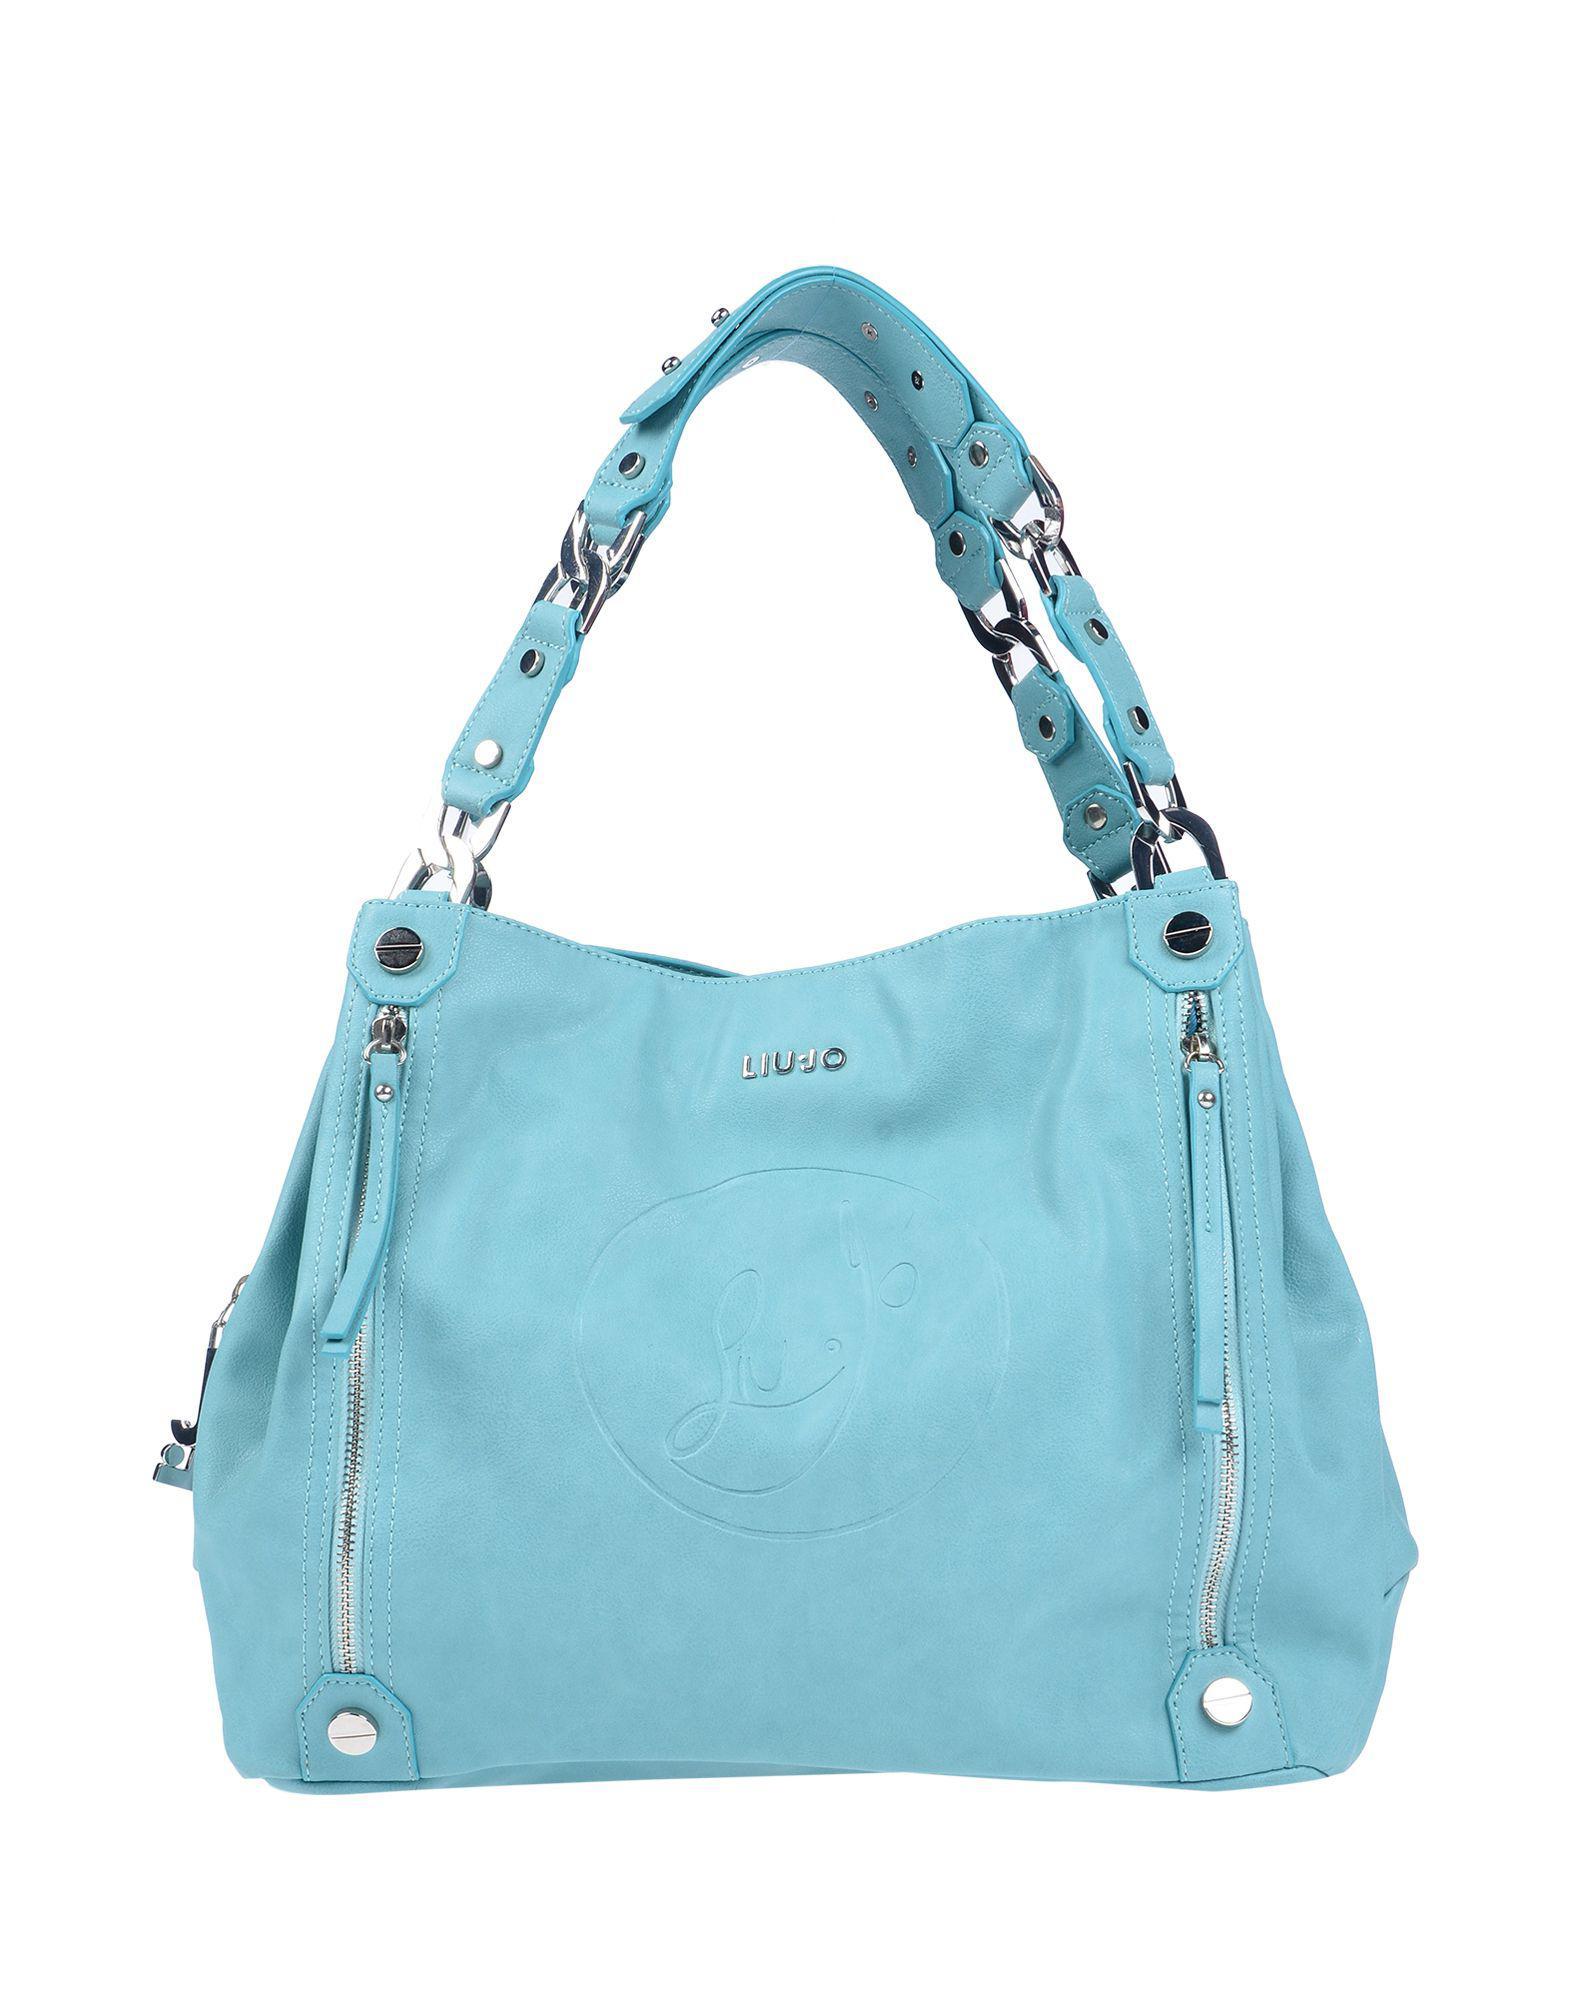 Lyst - Liu Jo Handbag in Blue 4fc341f25c6